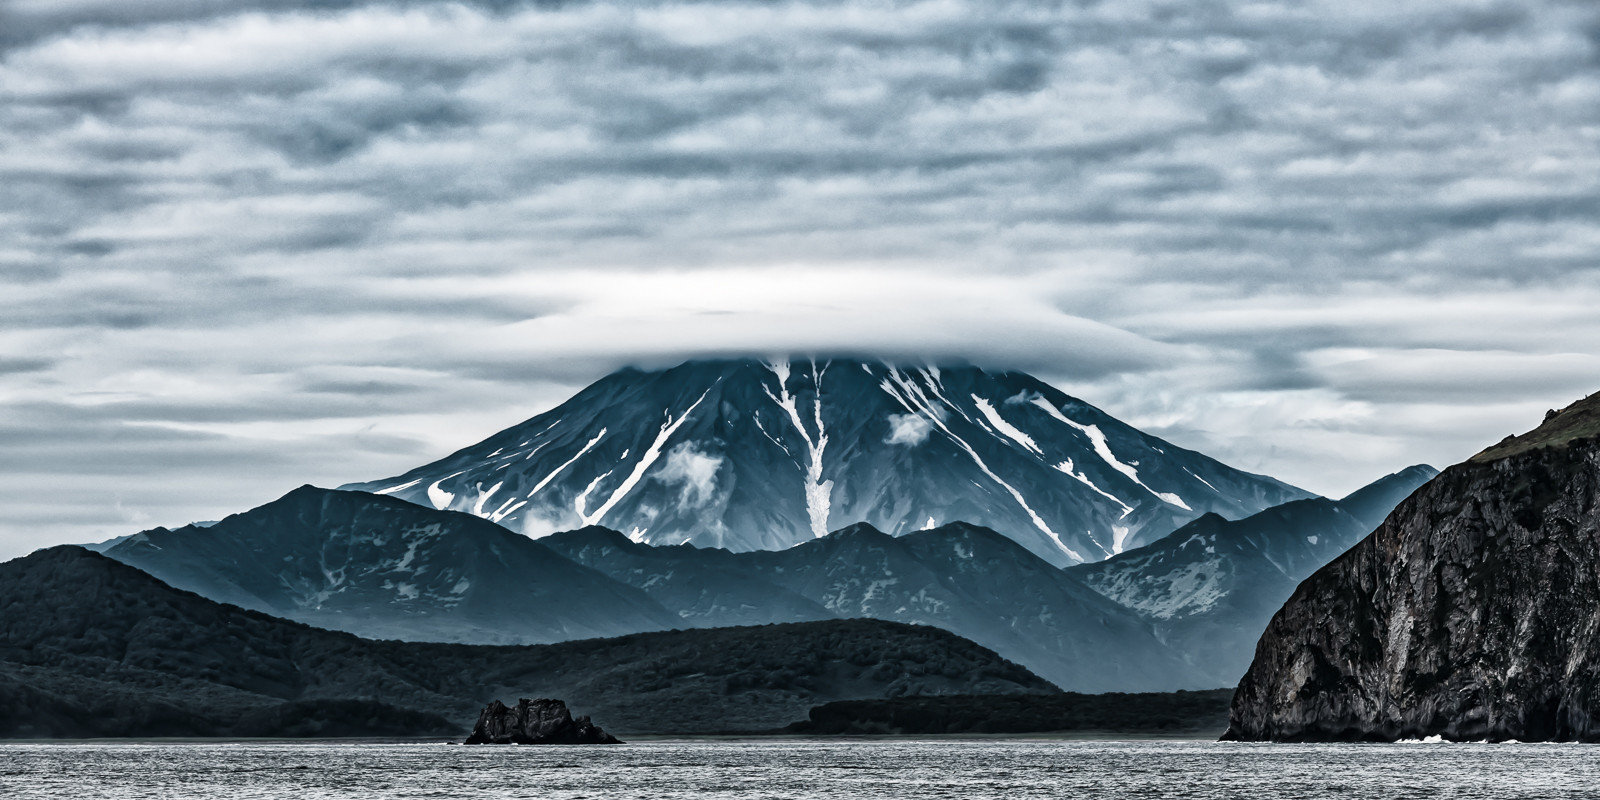 1809Kamchatka-landschap-1.jpg